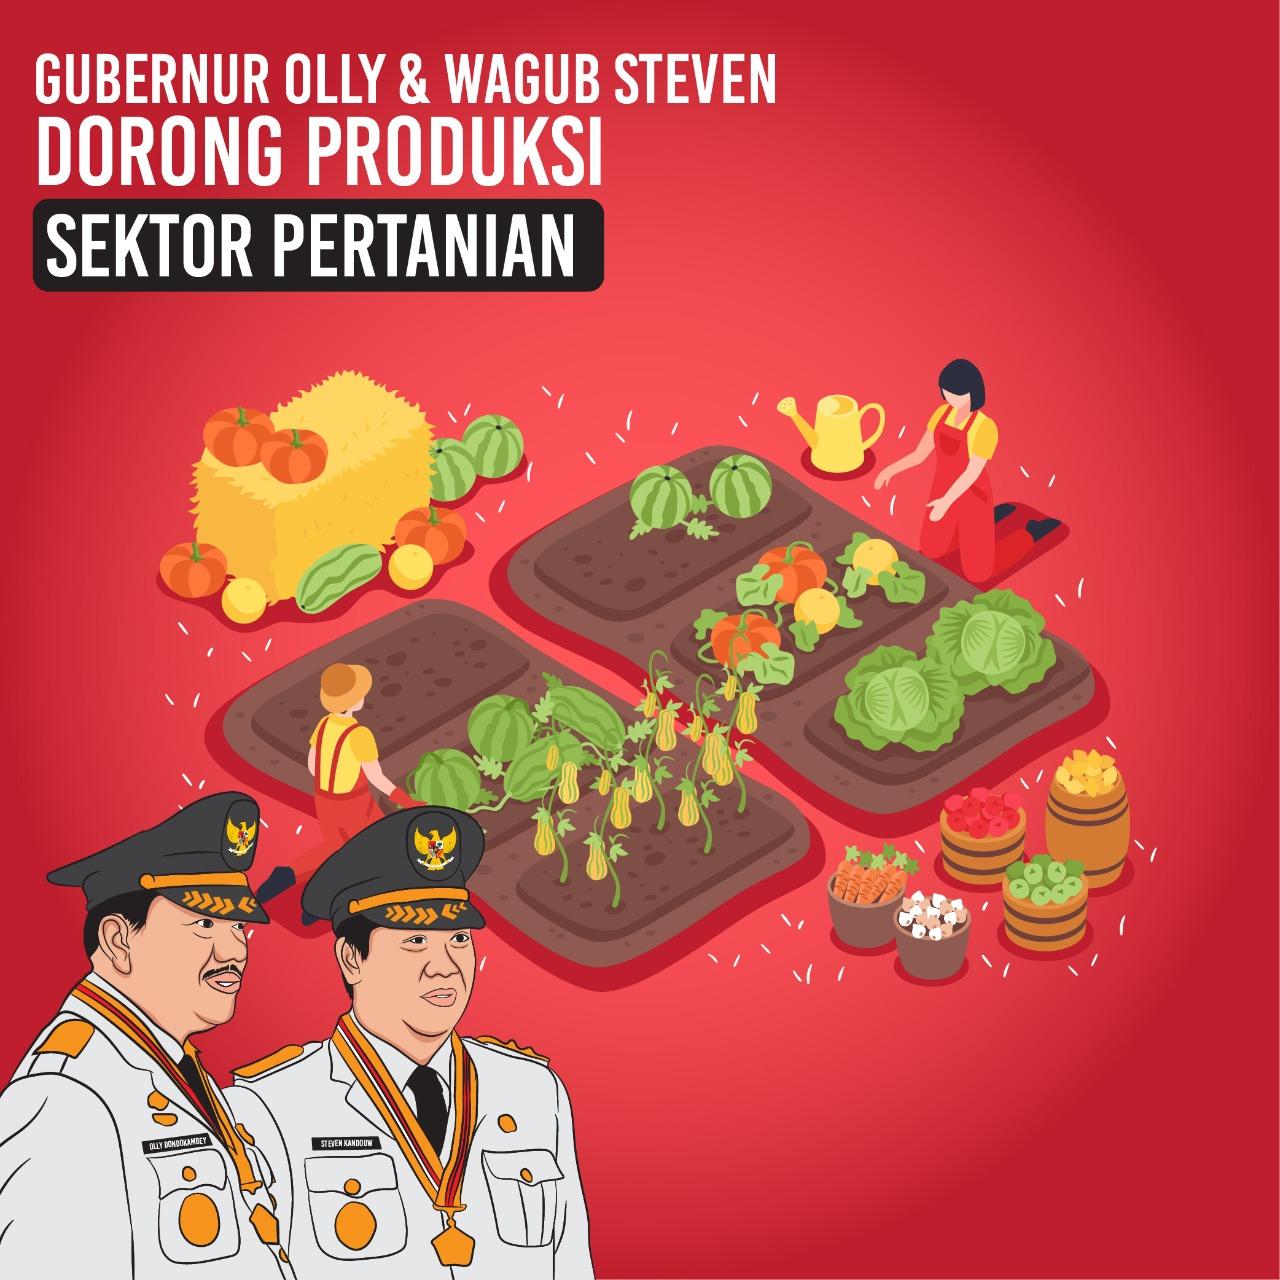 Pencapaian Di Sektor Pertanian Gubernur Sulawesi Utara Olly Dondokambey dan Wakil Gubernur Sulawesi Utara Steven Kandouw